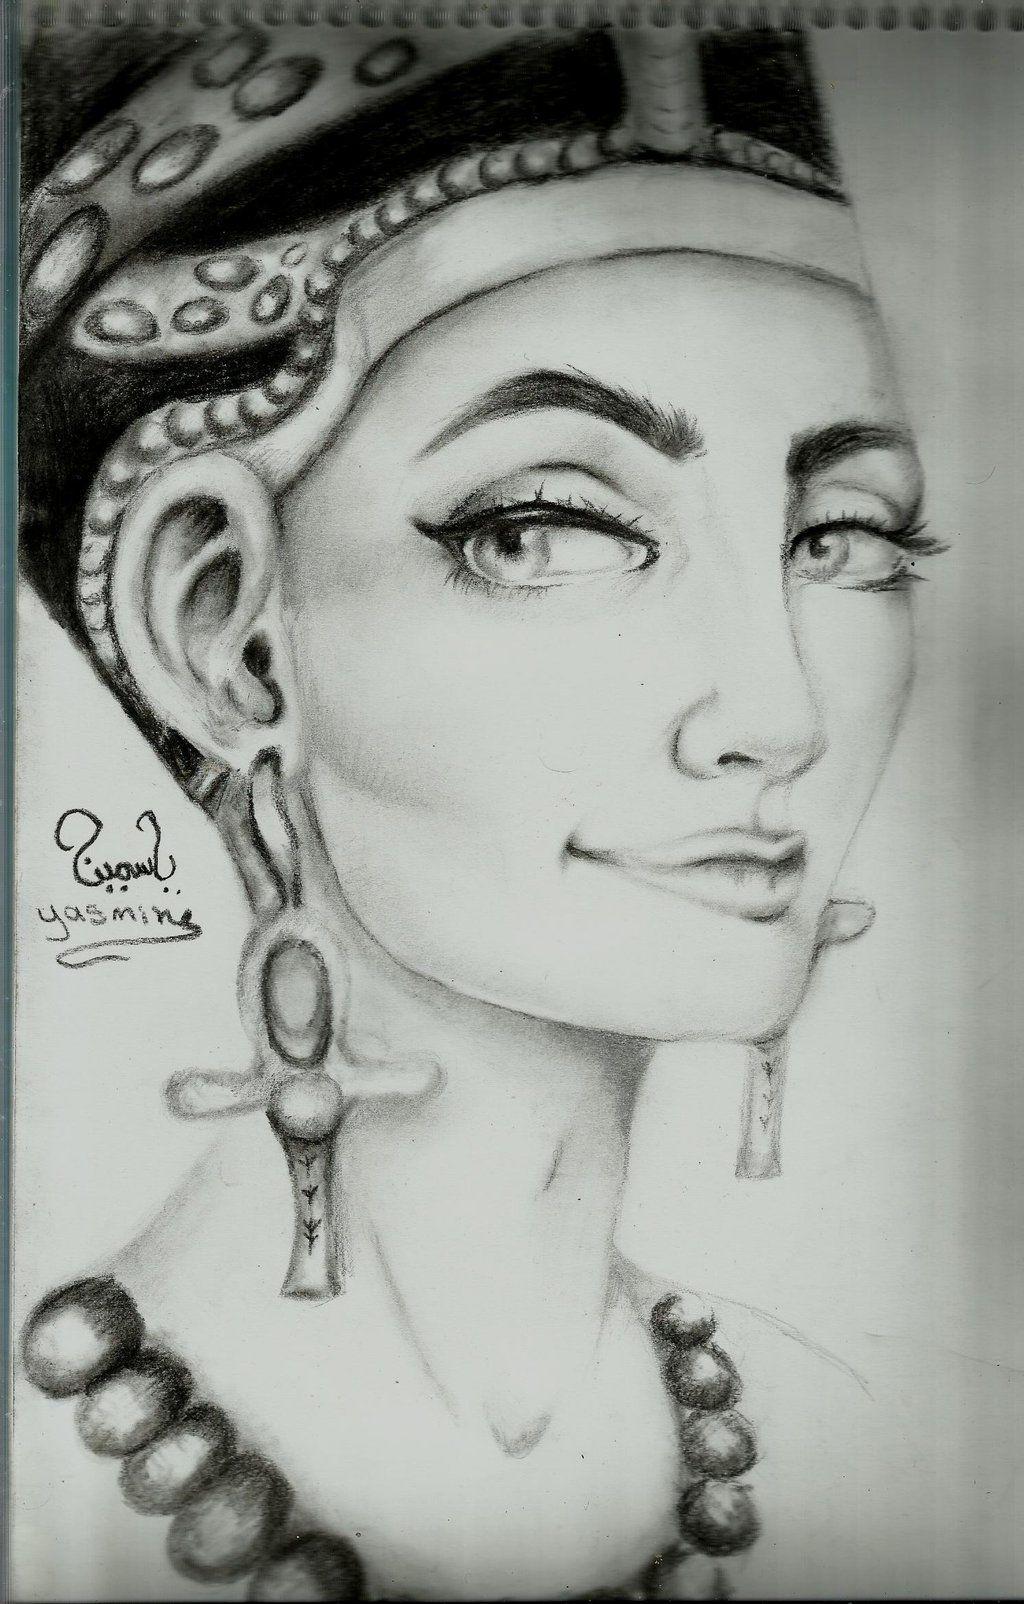 queen nefertiti - Google Search | Expressions | Pinterest ...